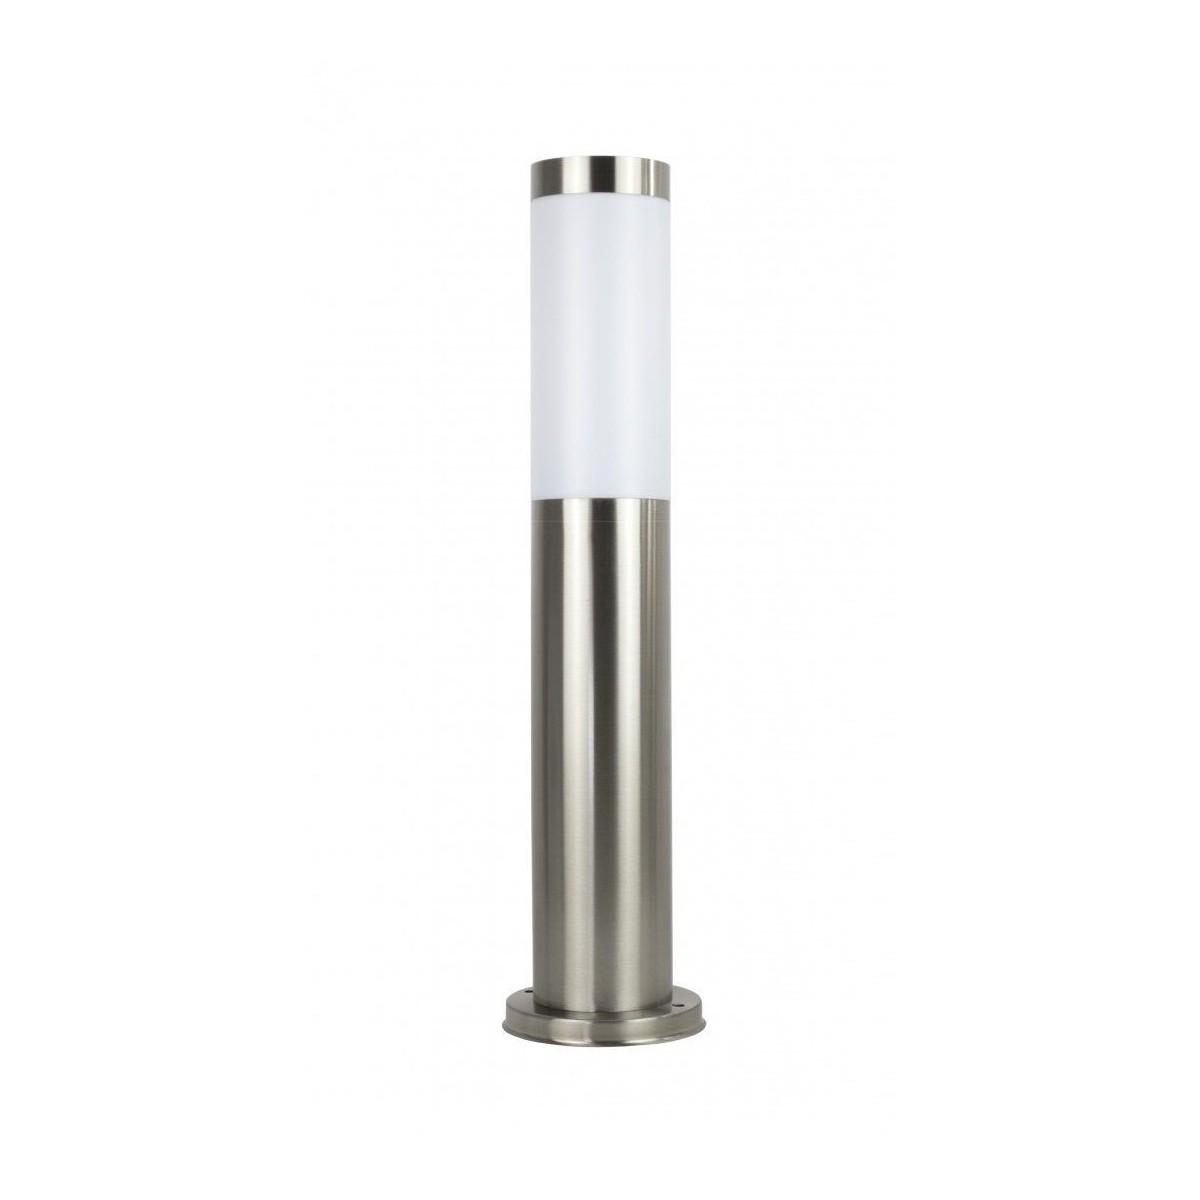 SU-MA Inox ST 022-450 45 cm Stojąca